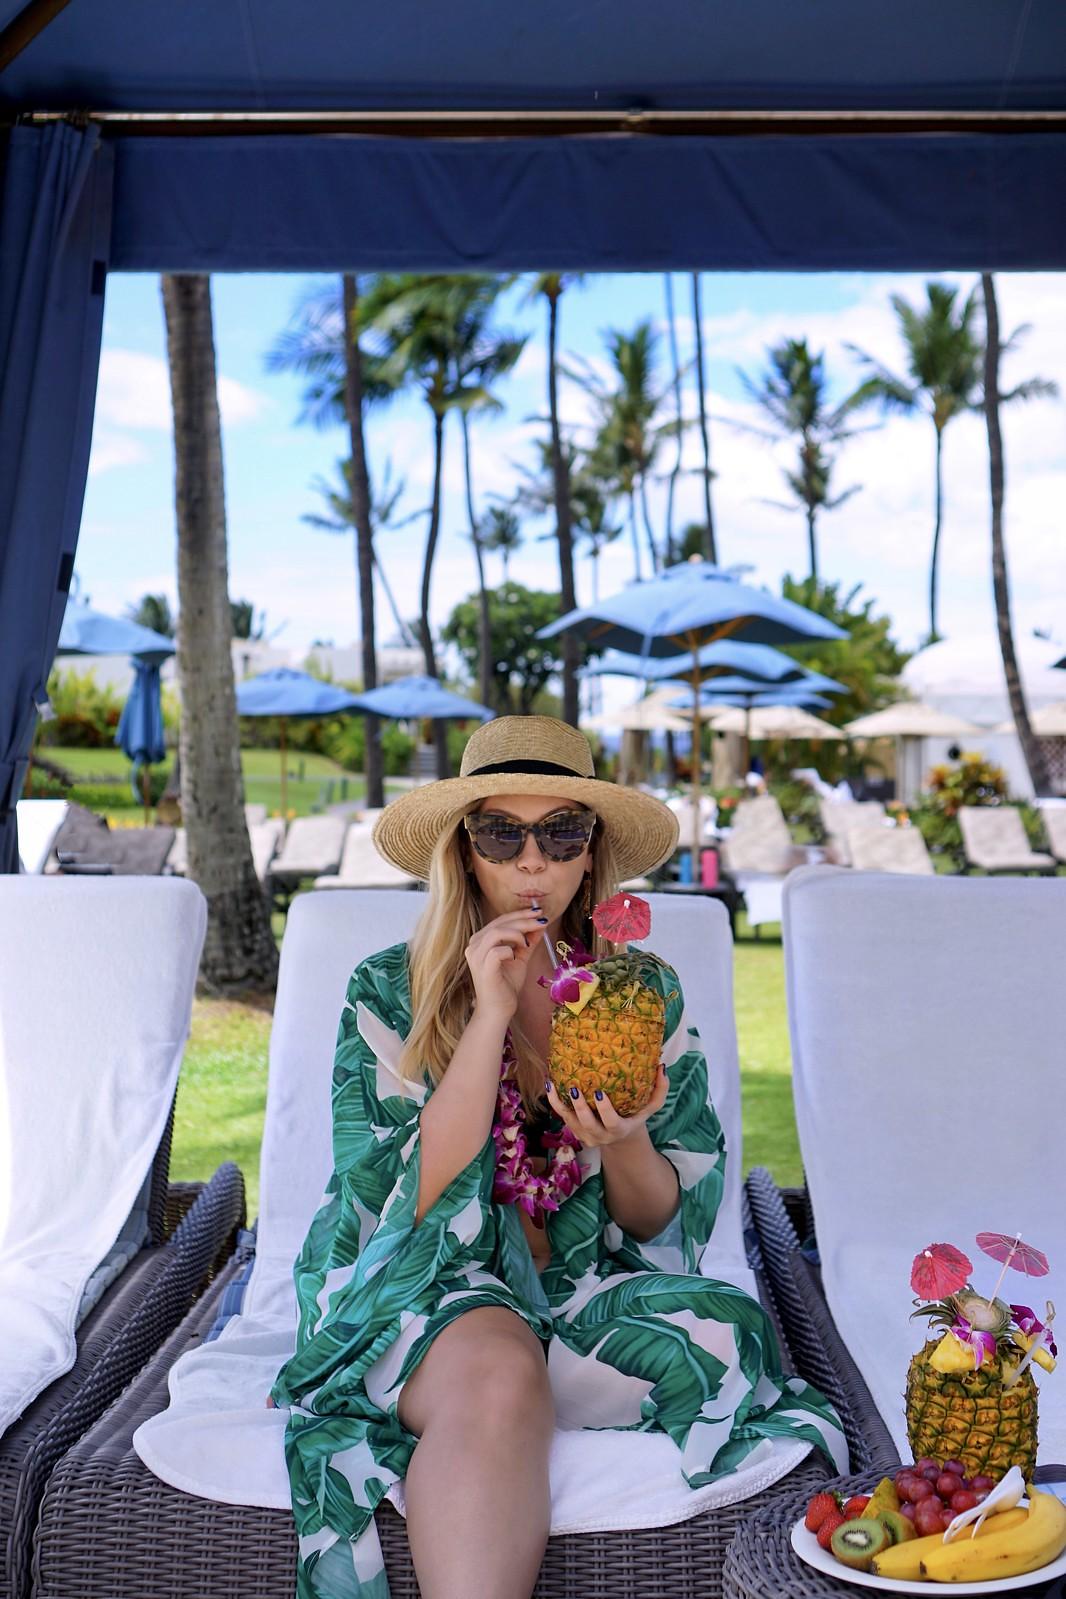 Fairmont Hotel Maui Hawaii | Cabana at Pool | Pineapple Drink | Palm Print Kimono